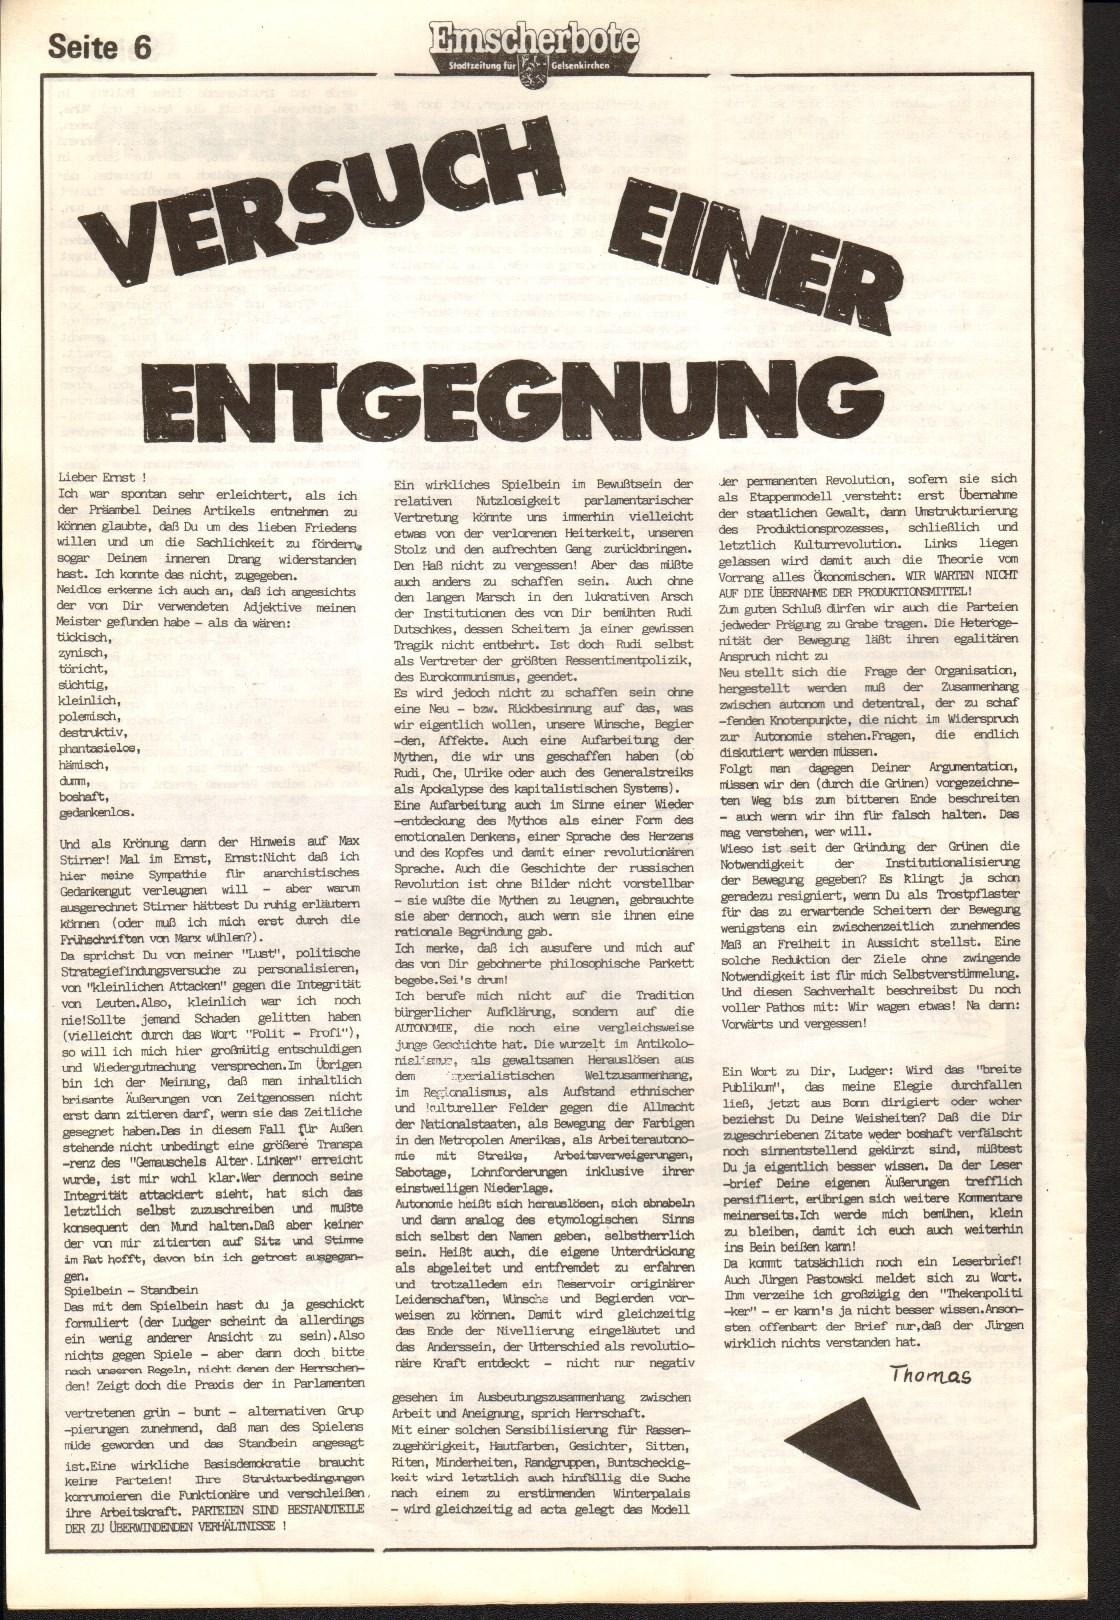 Gelsenkirchen_Emscherbote_1983_31_06